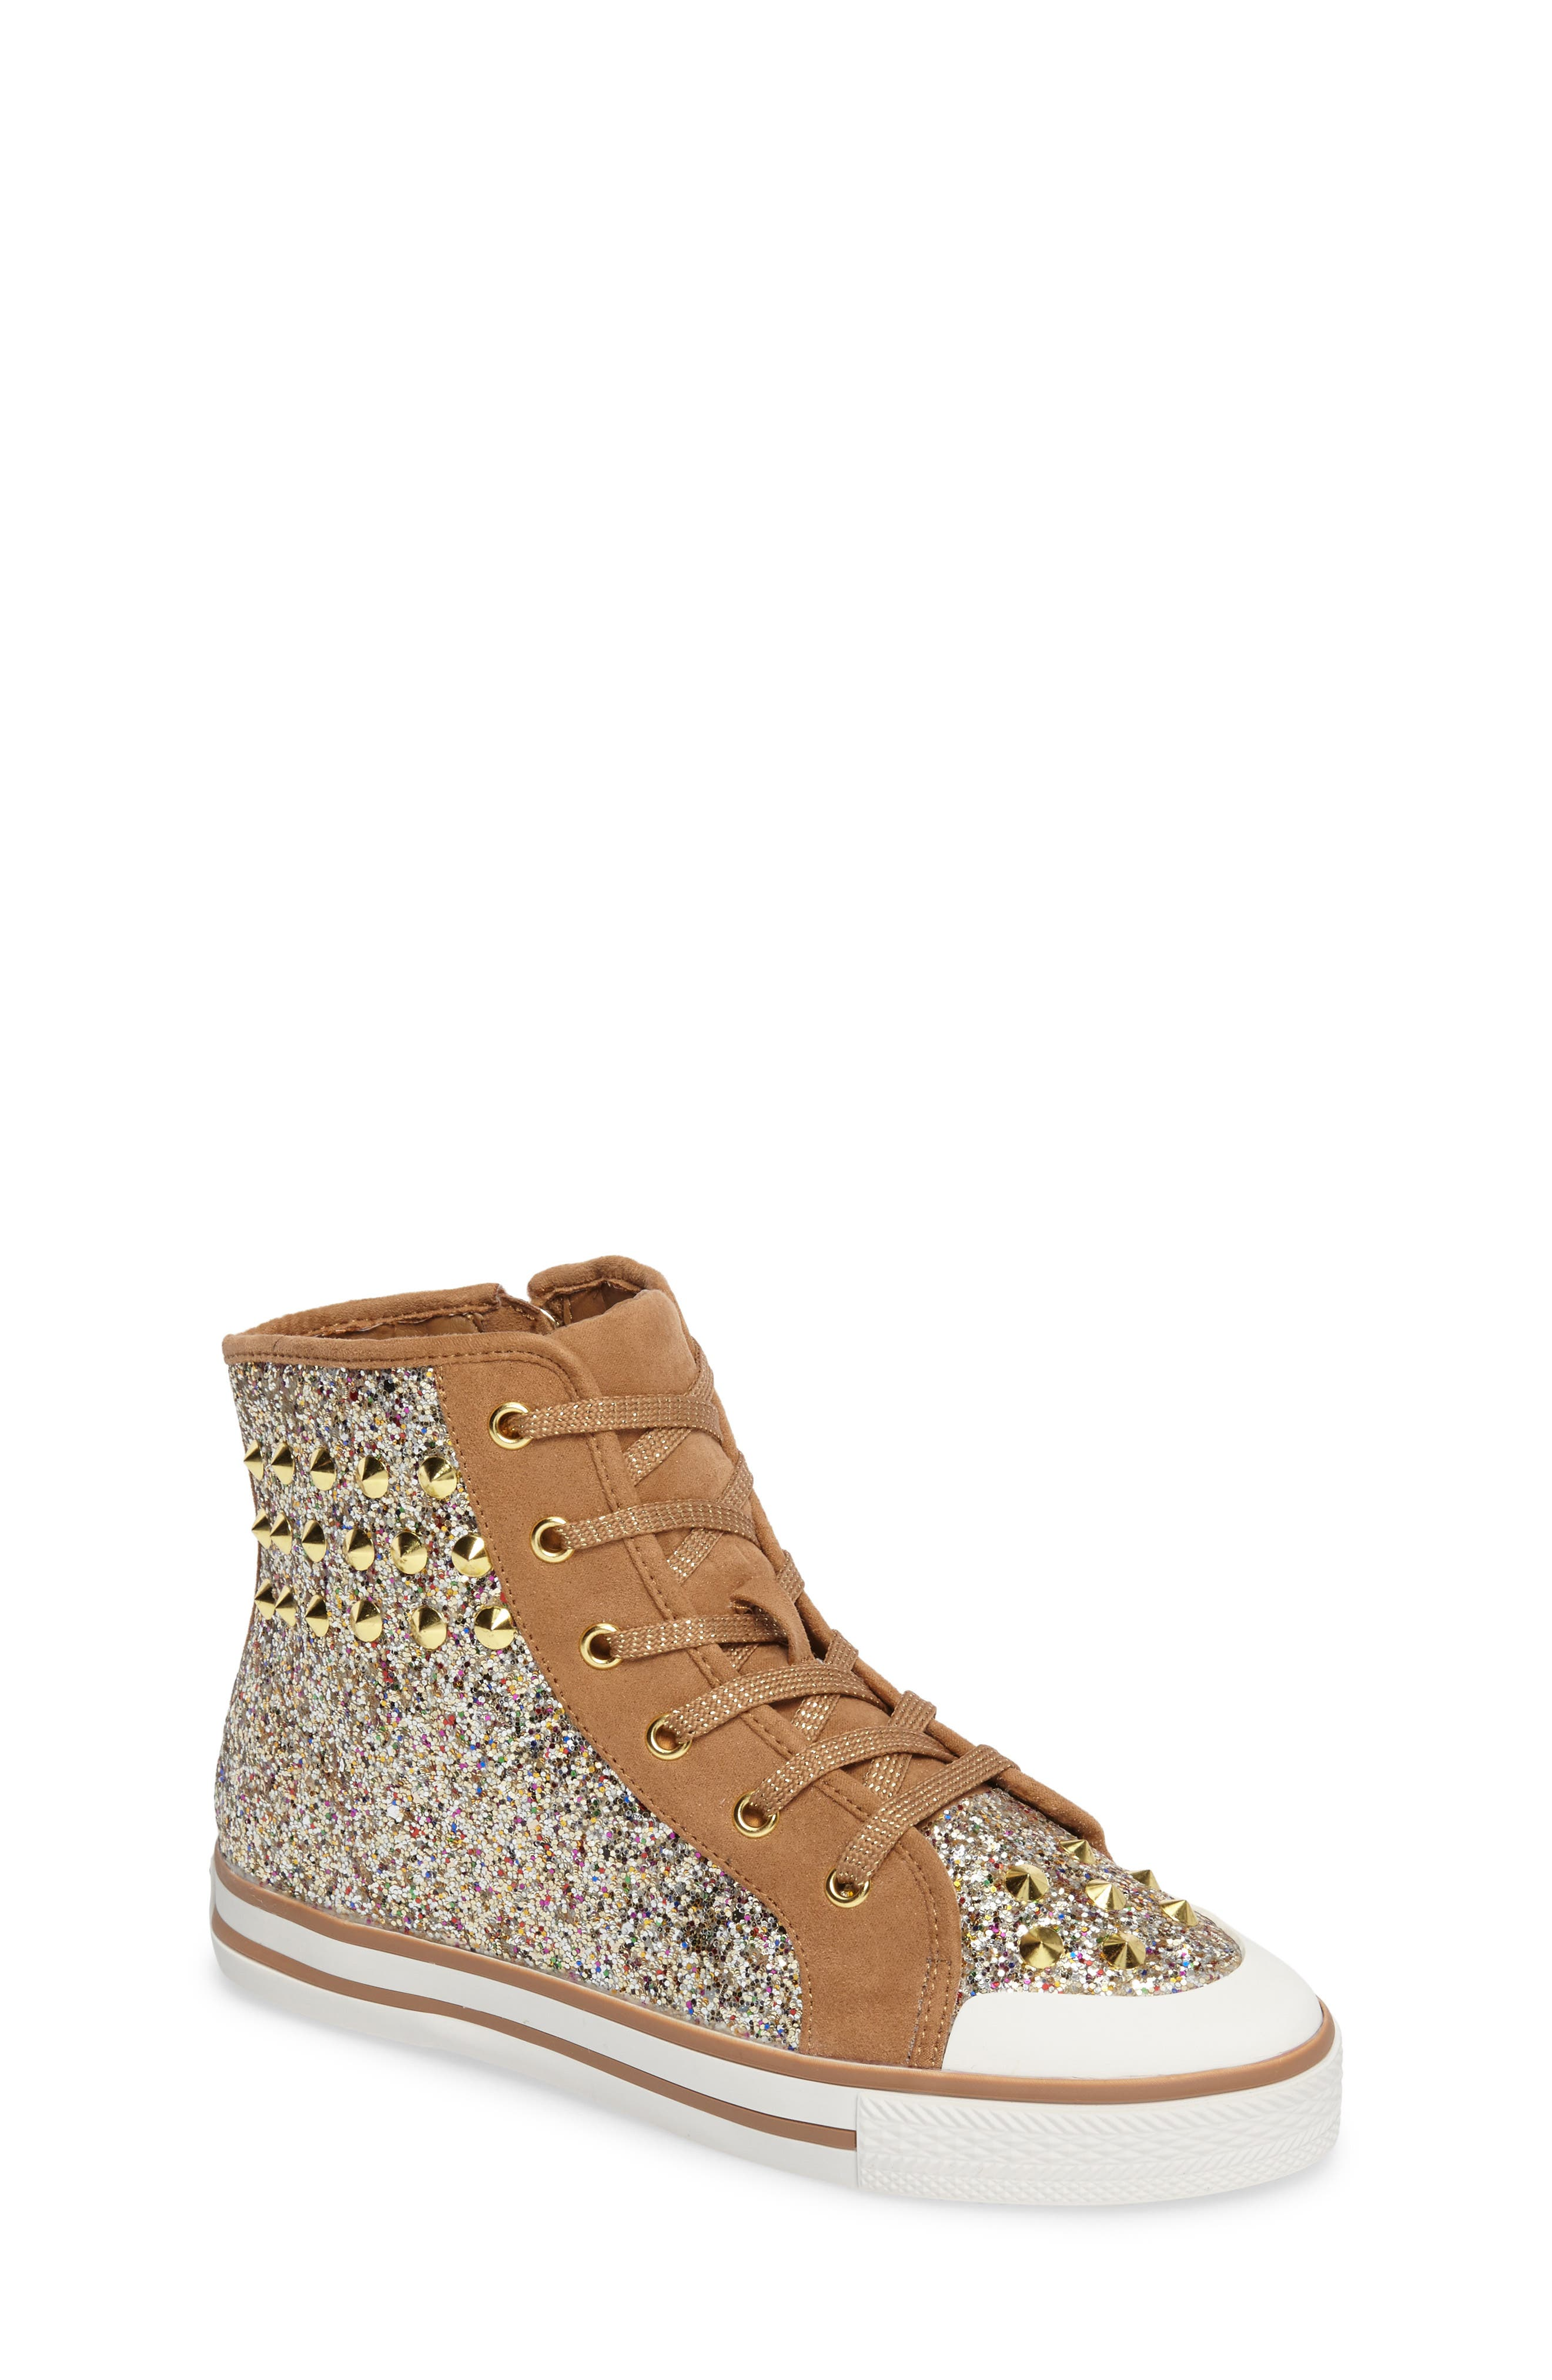 Alternate Image 1 Selected - Ash Lita Roe Glittery High Top Sneaker (Toddler, Little Kid & Big Kid)